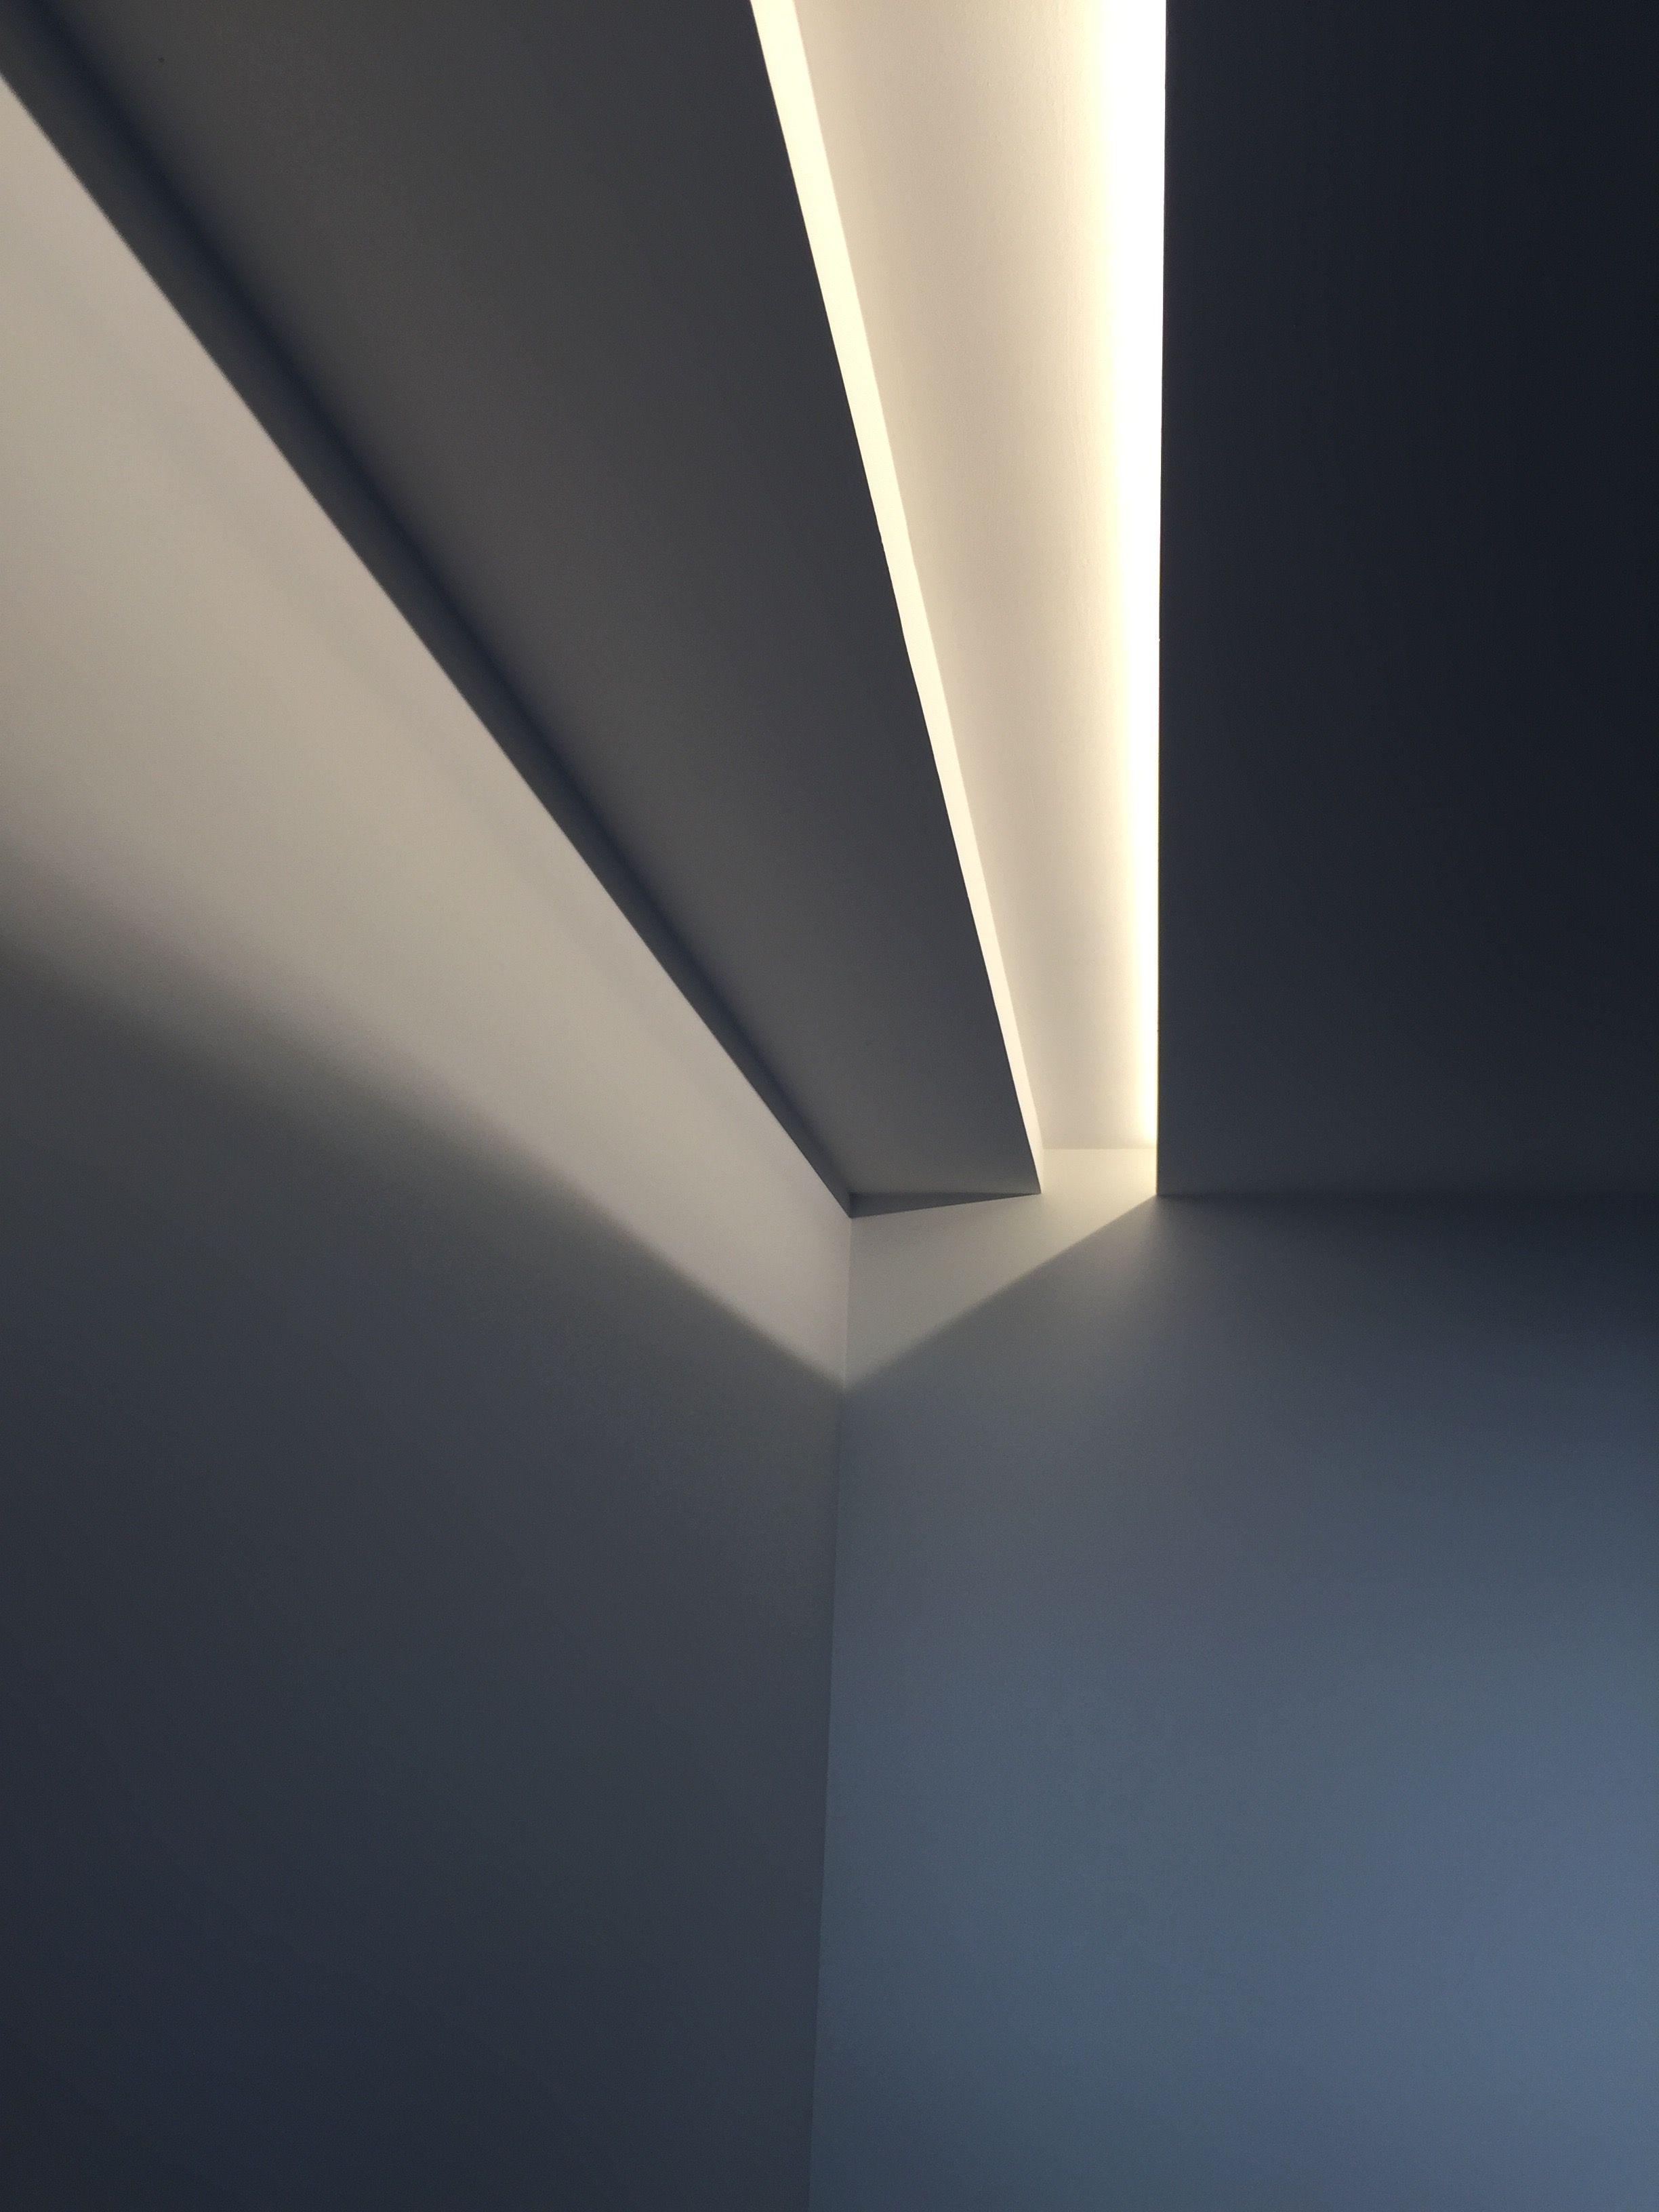 iluminaci n led mediante luz indirecta con foseado en pladur pinterest salle de. Black Bedroom Furniture Sets. Home Design Ideas